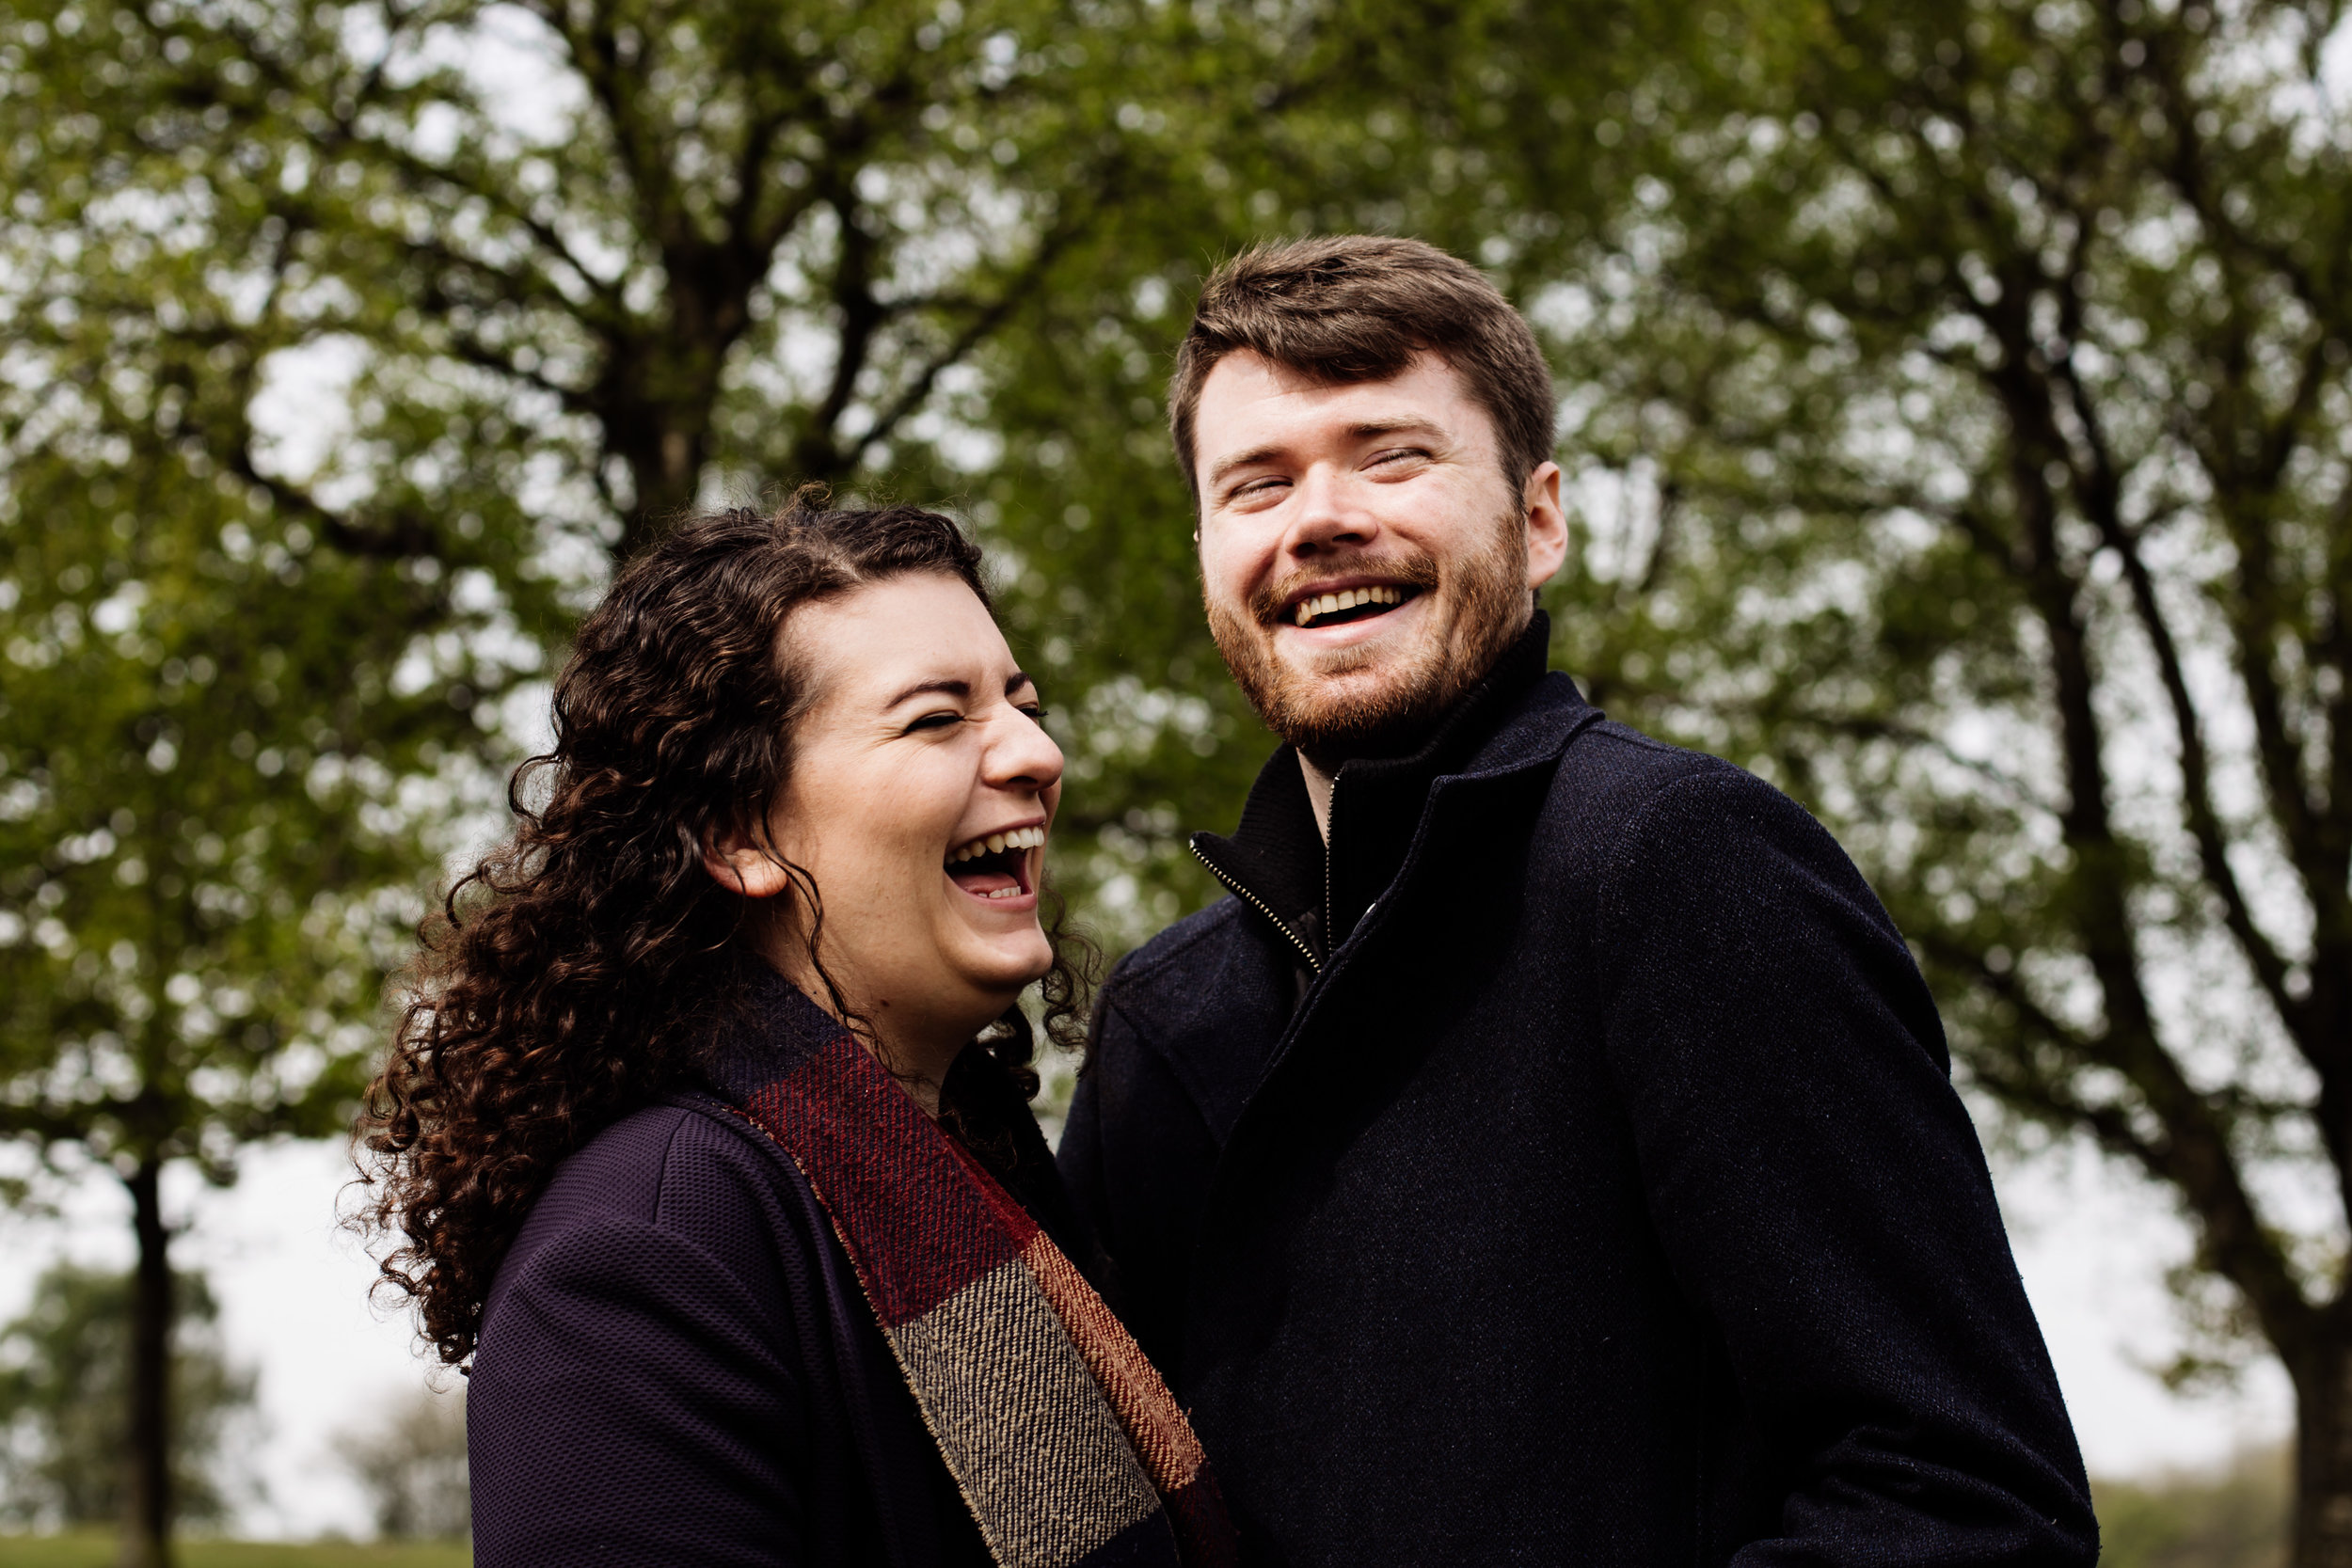 Isobel-and-Daniel-PreWeddingShoot-5.jpg